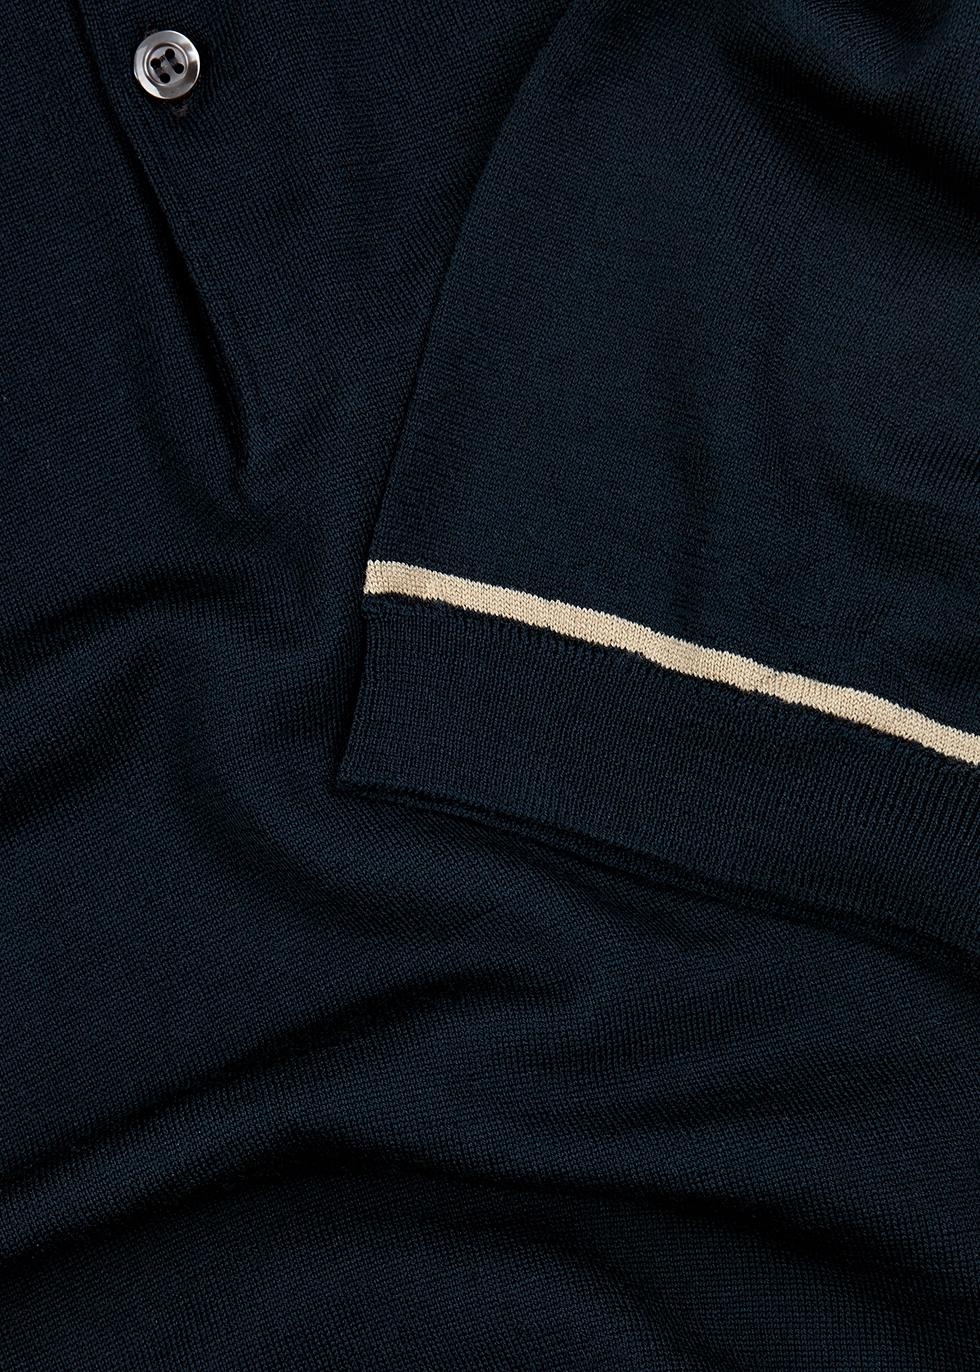 Beekroft dark teal wool polo shirt - John Smedley